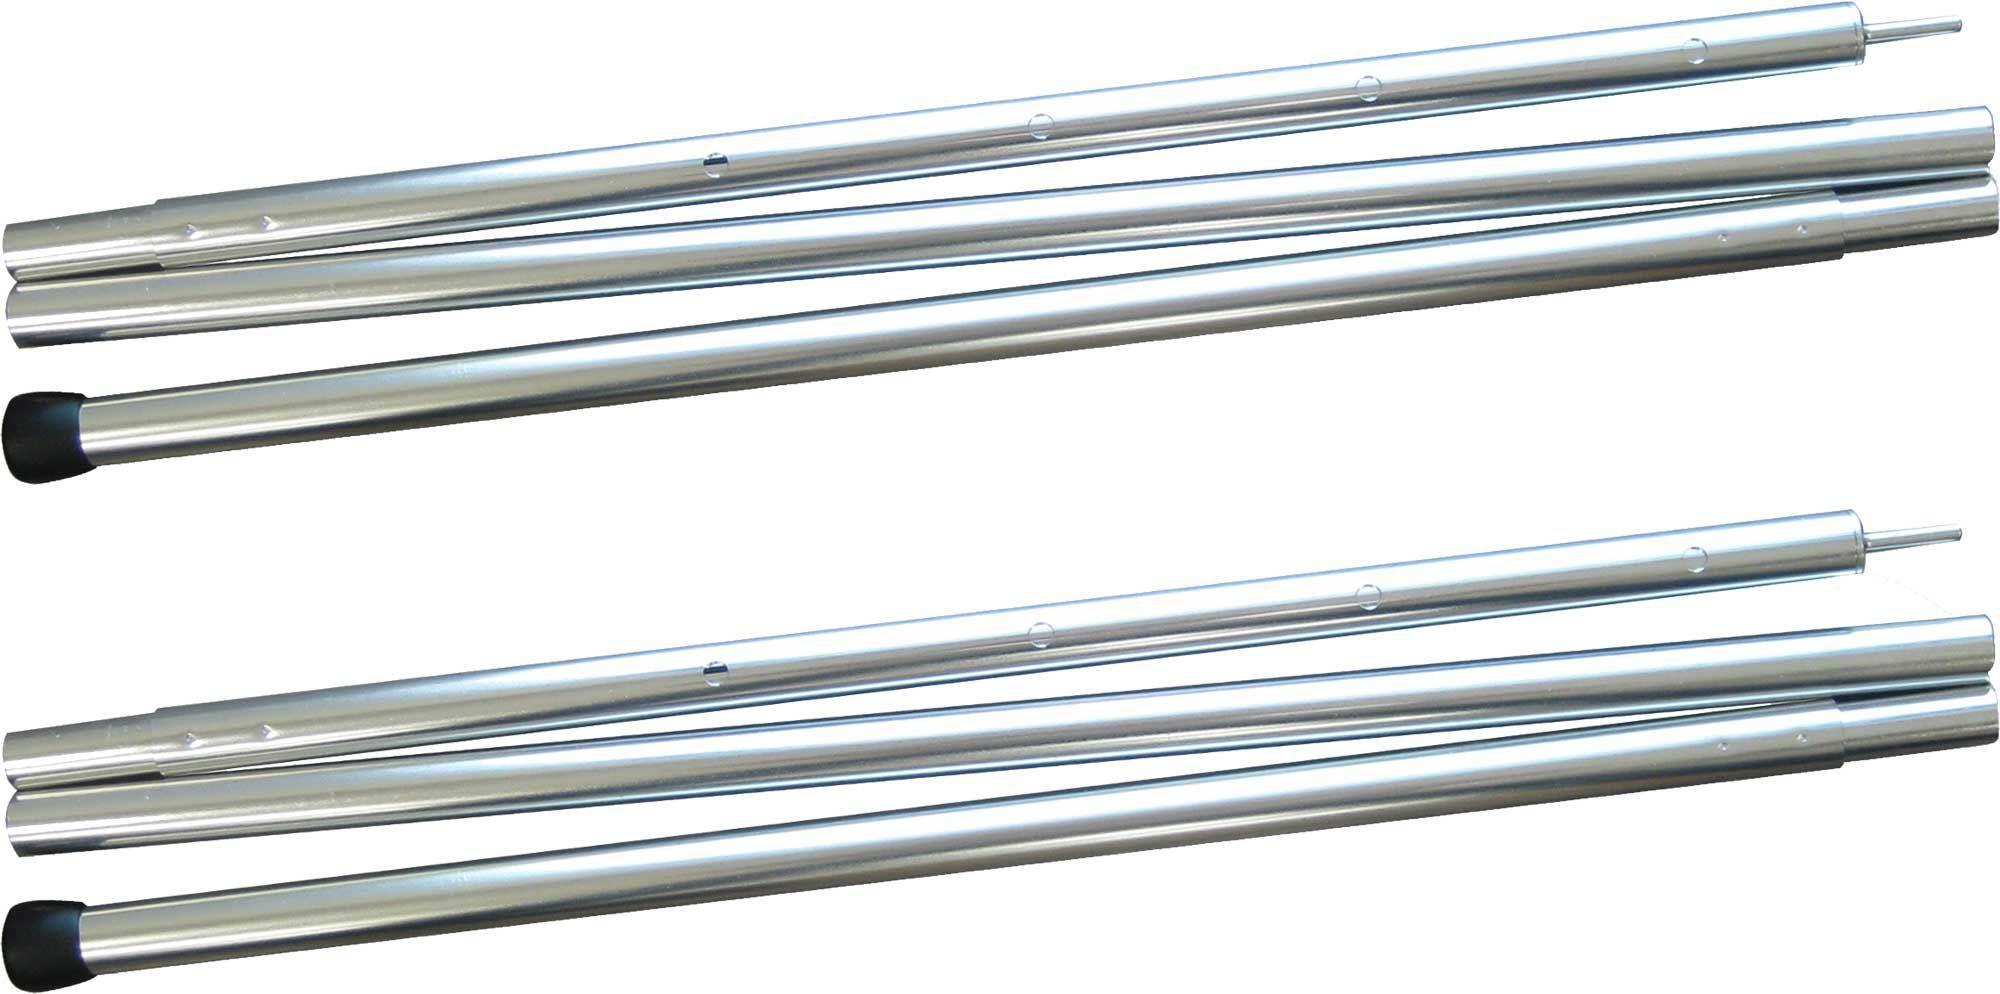 Mountainsmith Aluminum Tarp Poles, Gray Tarp poles